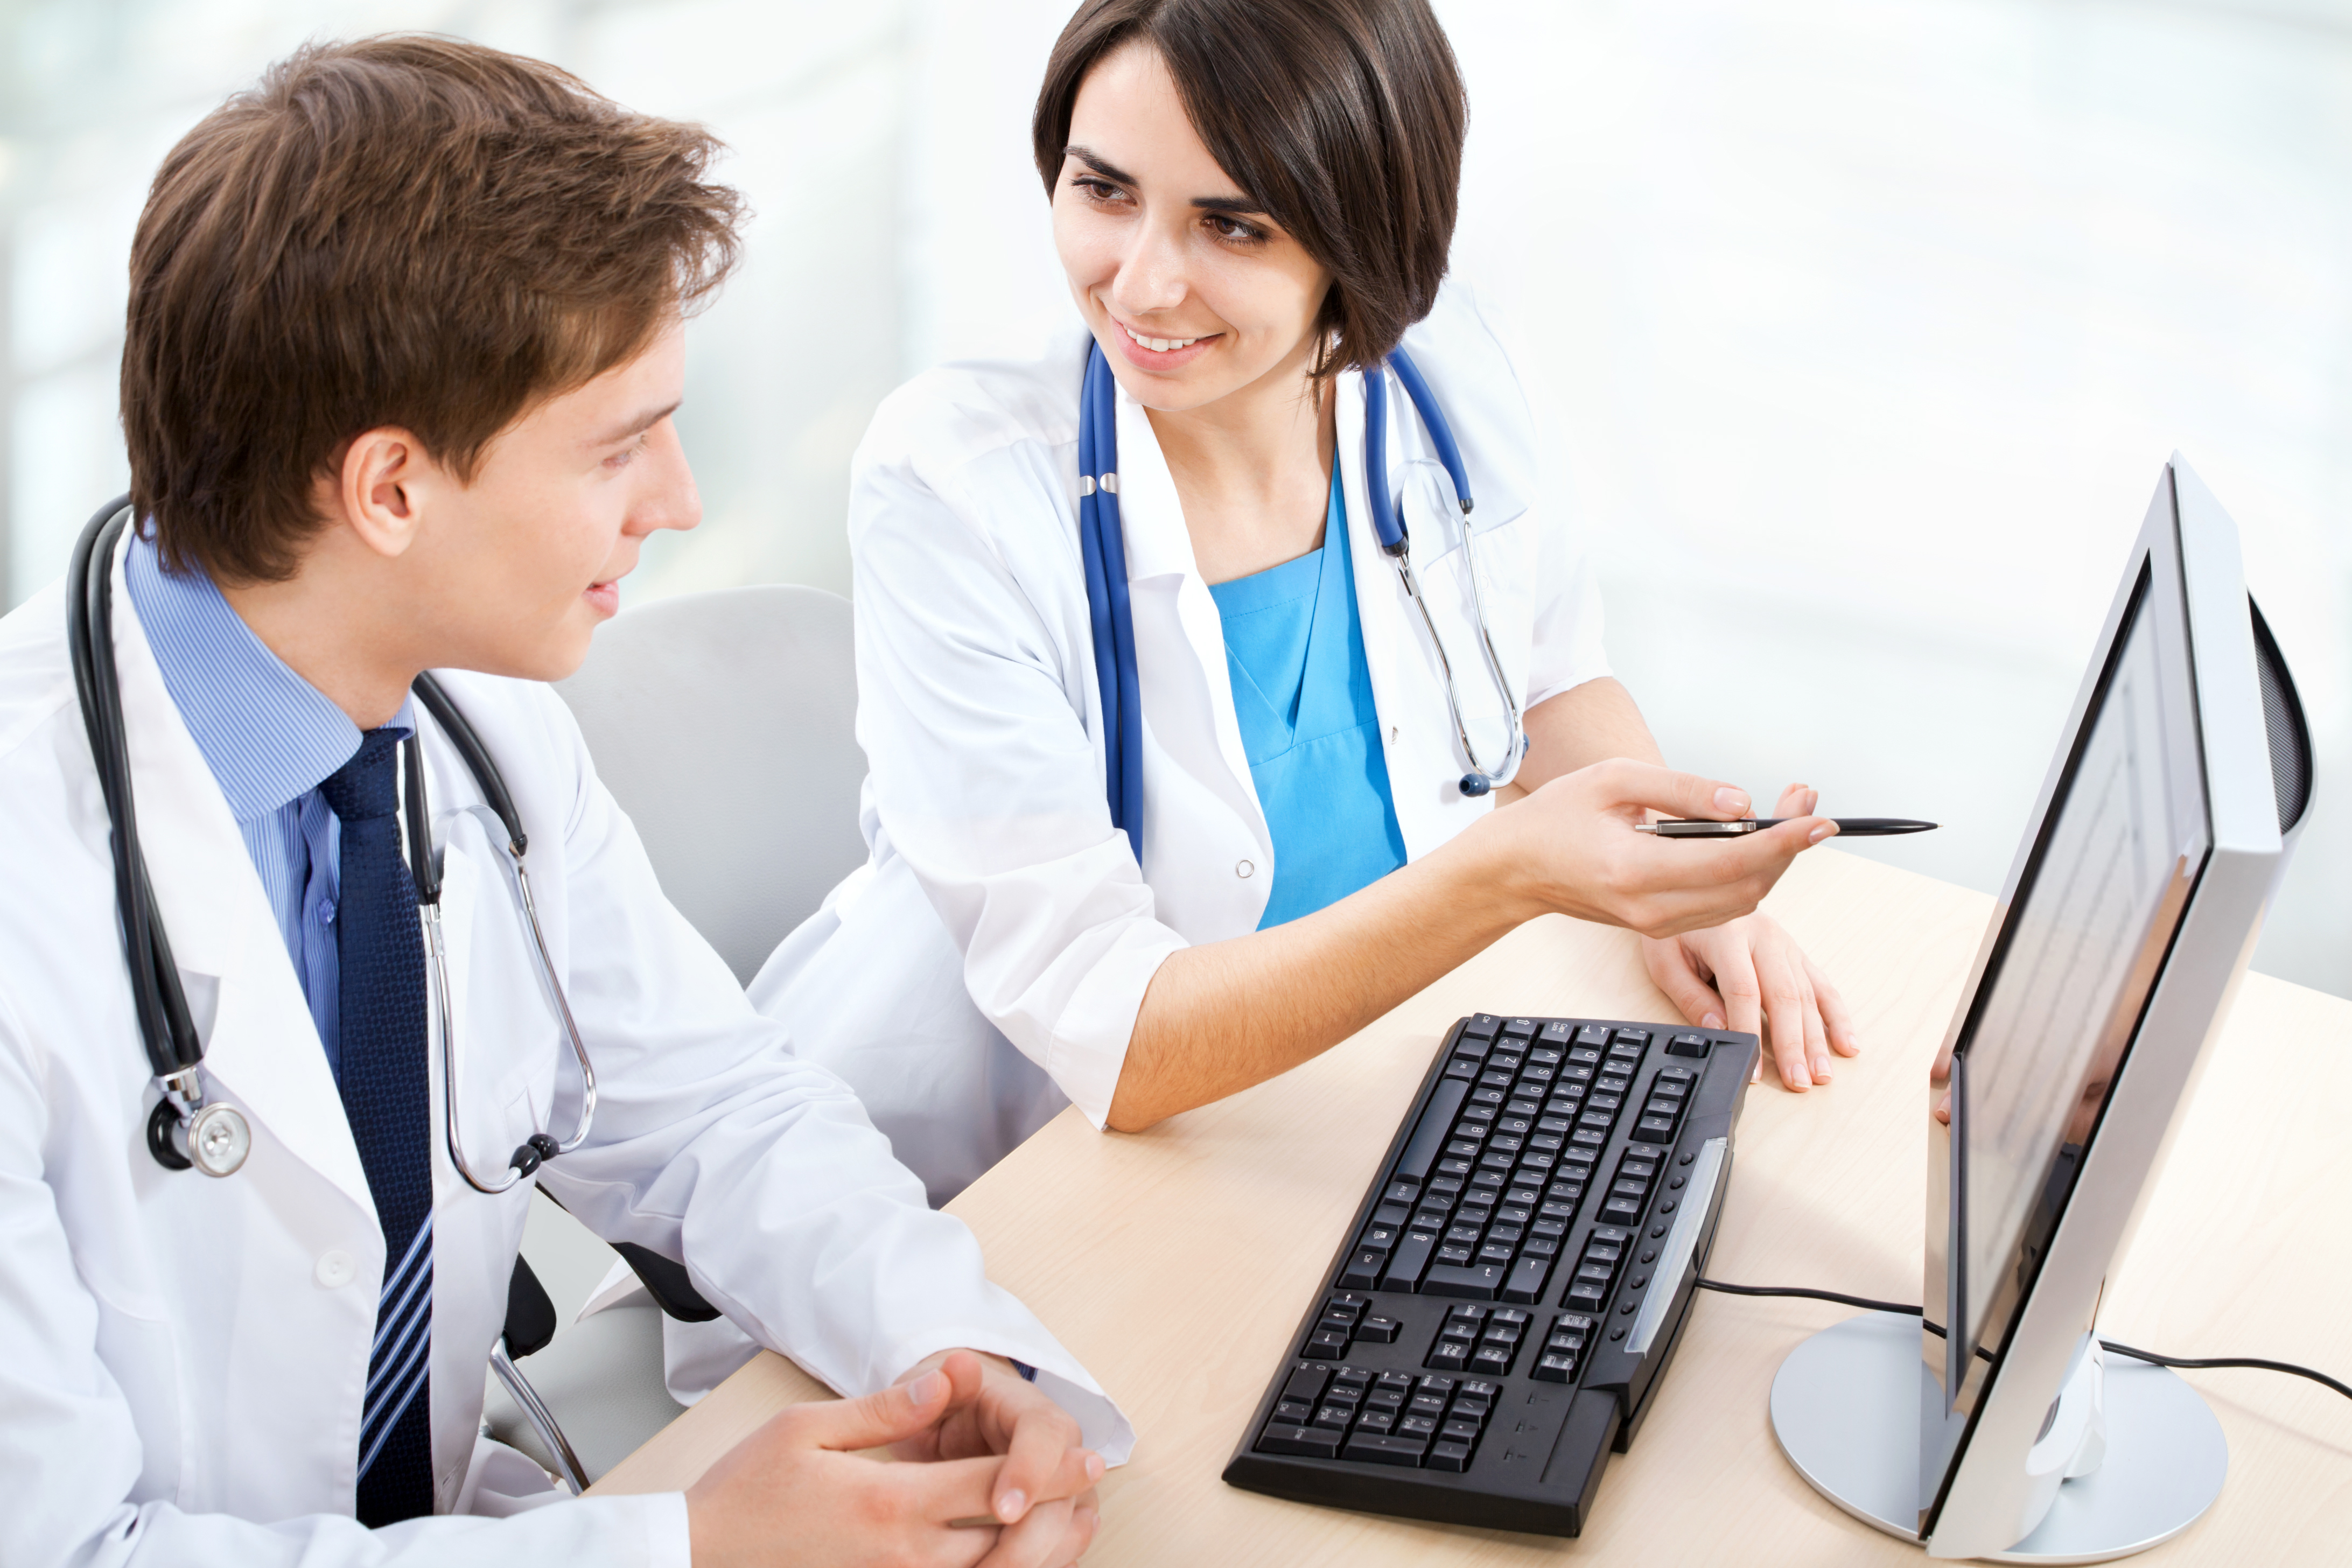 Картинка врач и компьютер